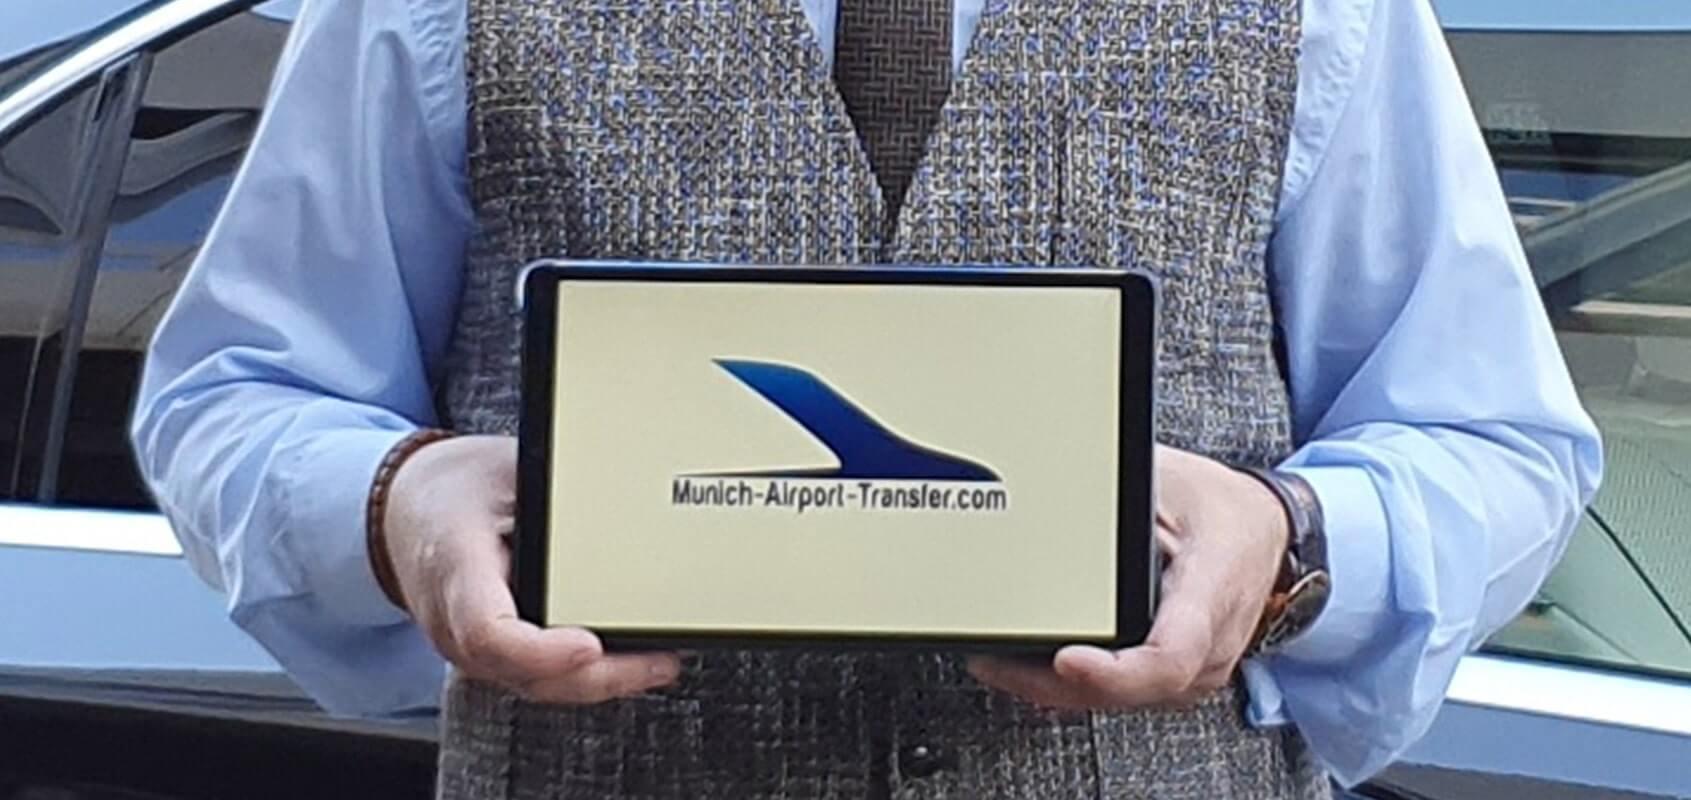 munich-airport-transfer-image-15-min